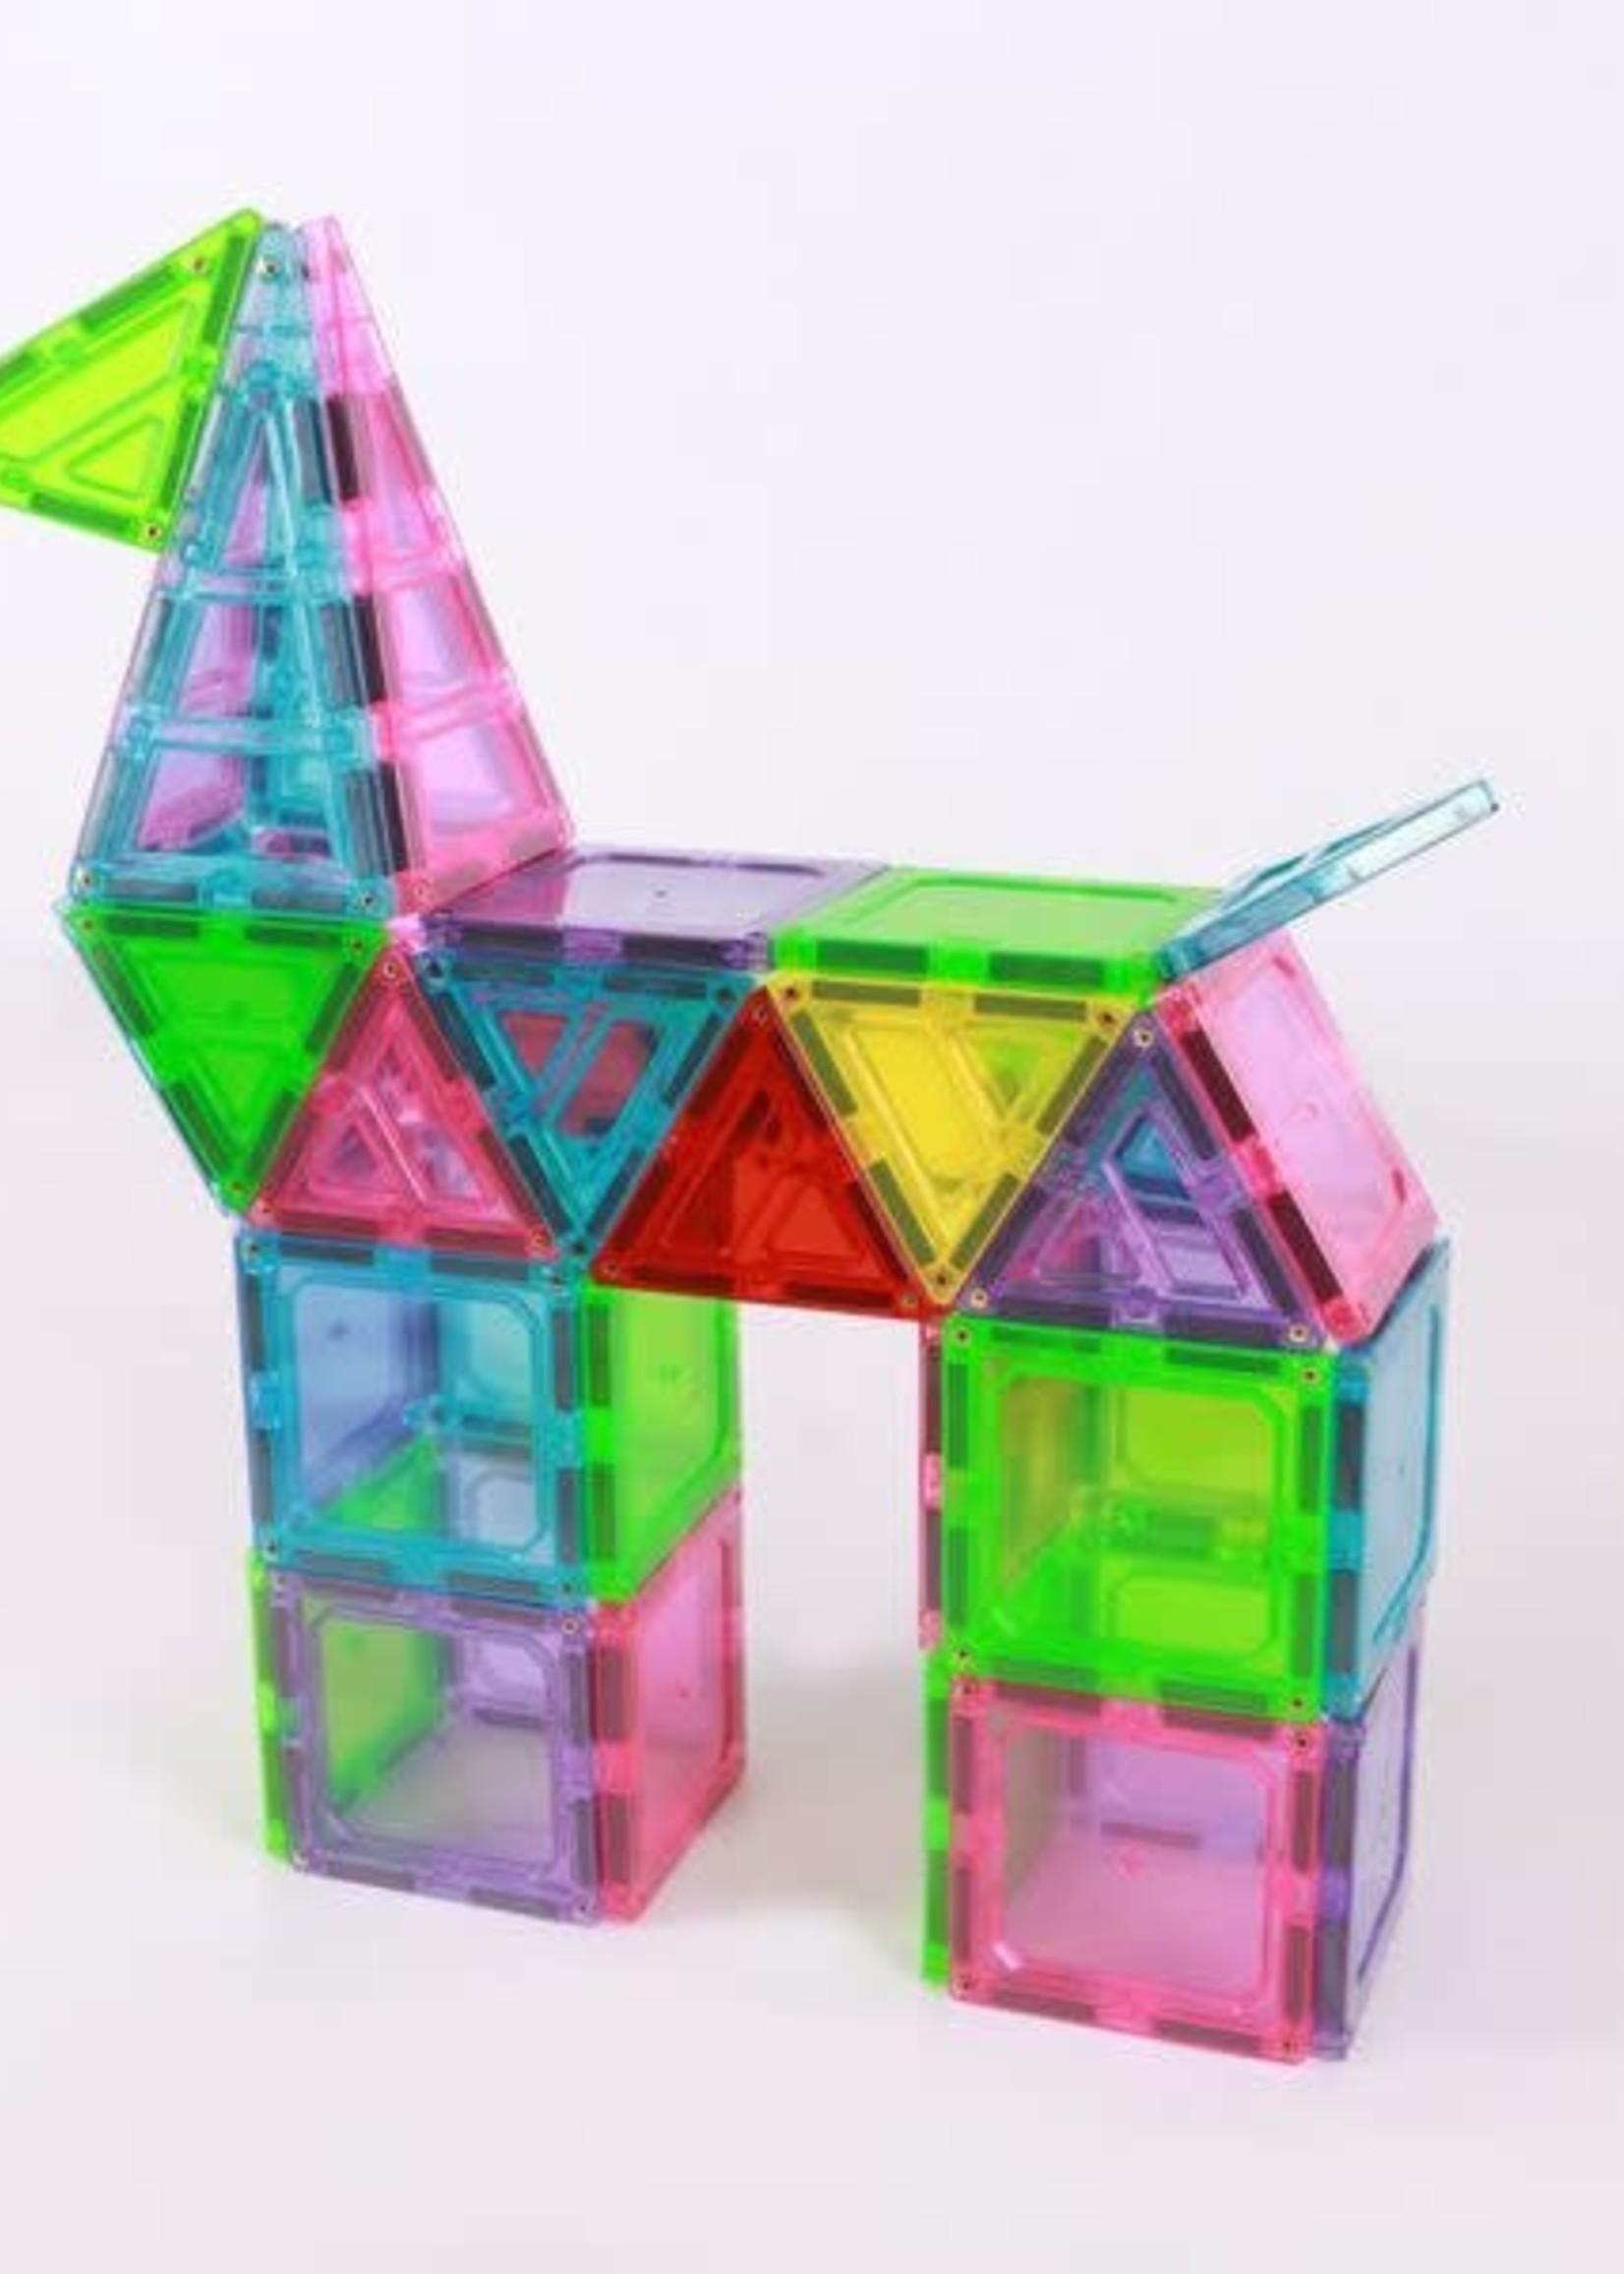 Sprout Tile Sprout Tile Magnetic Building Tiles (100pc)